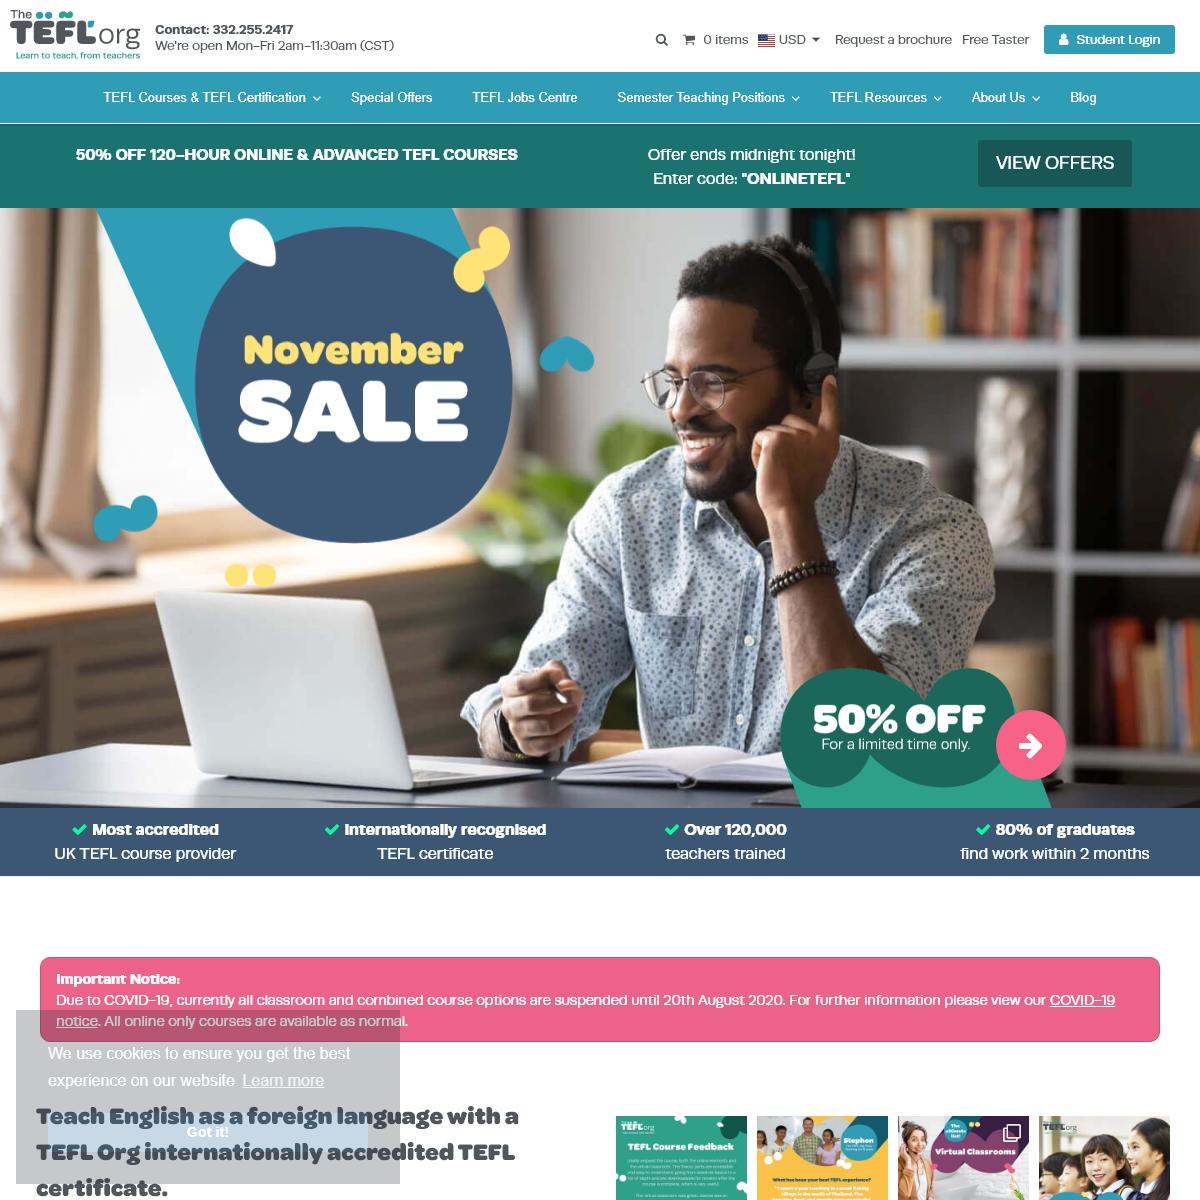 TEFL Org - Accredited TEFL Certification - Jobs Worldwide